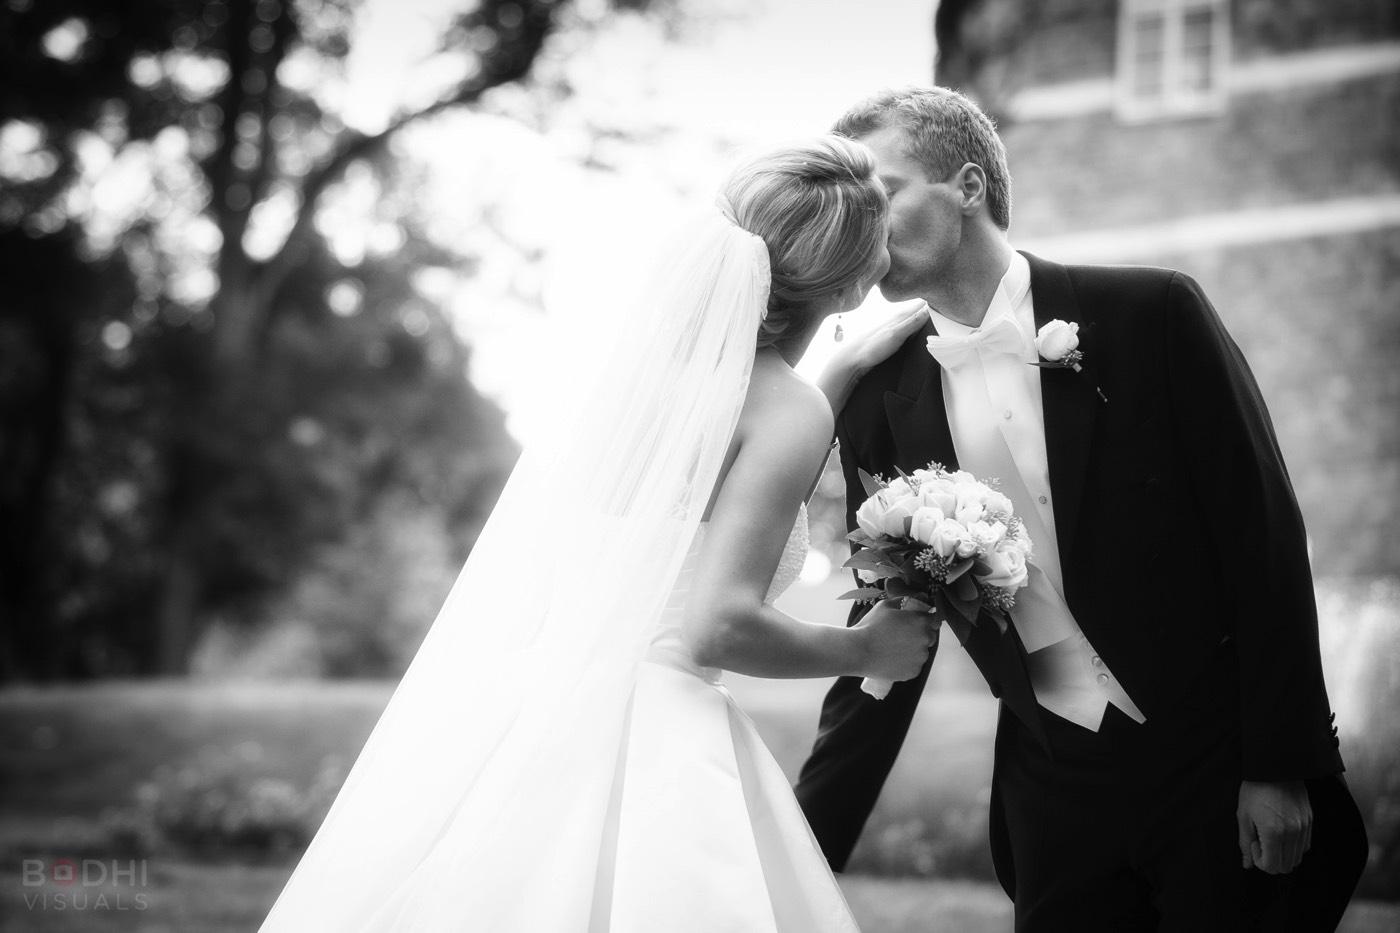 Bodhi-Visuals-Bryllupsbilleder-reference-12-1400pxl